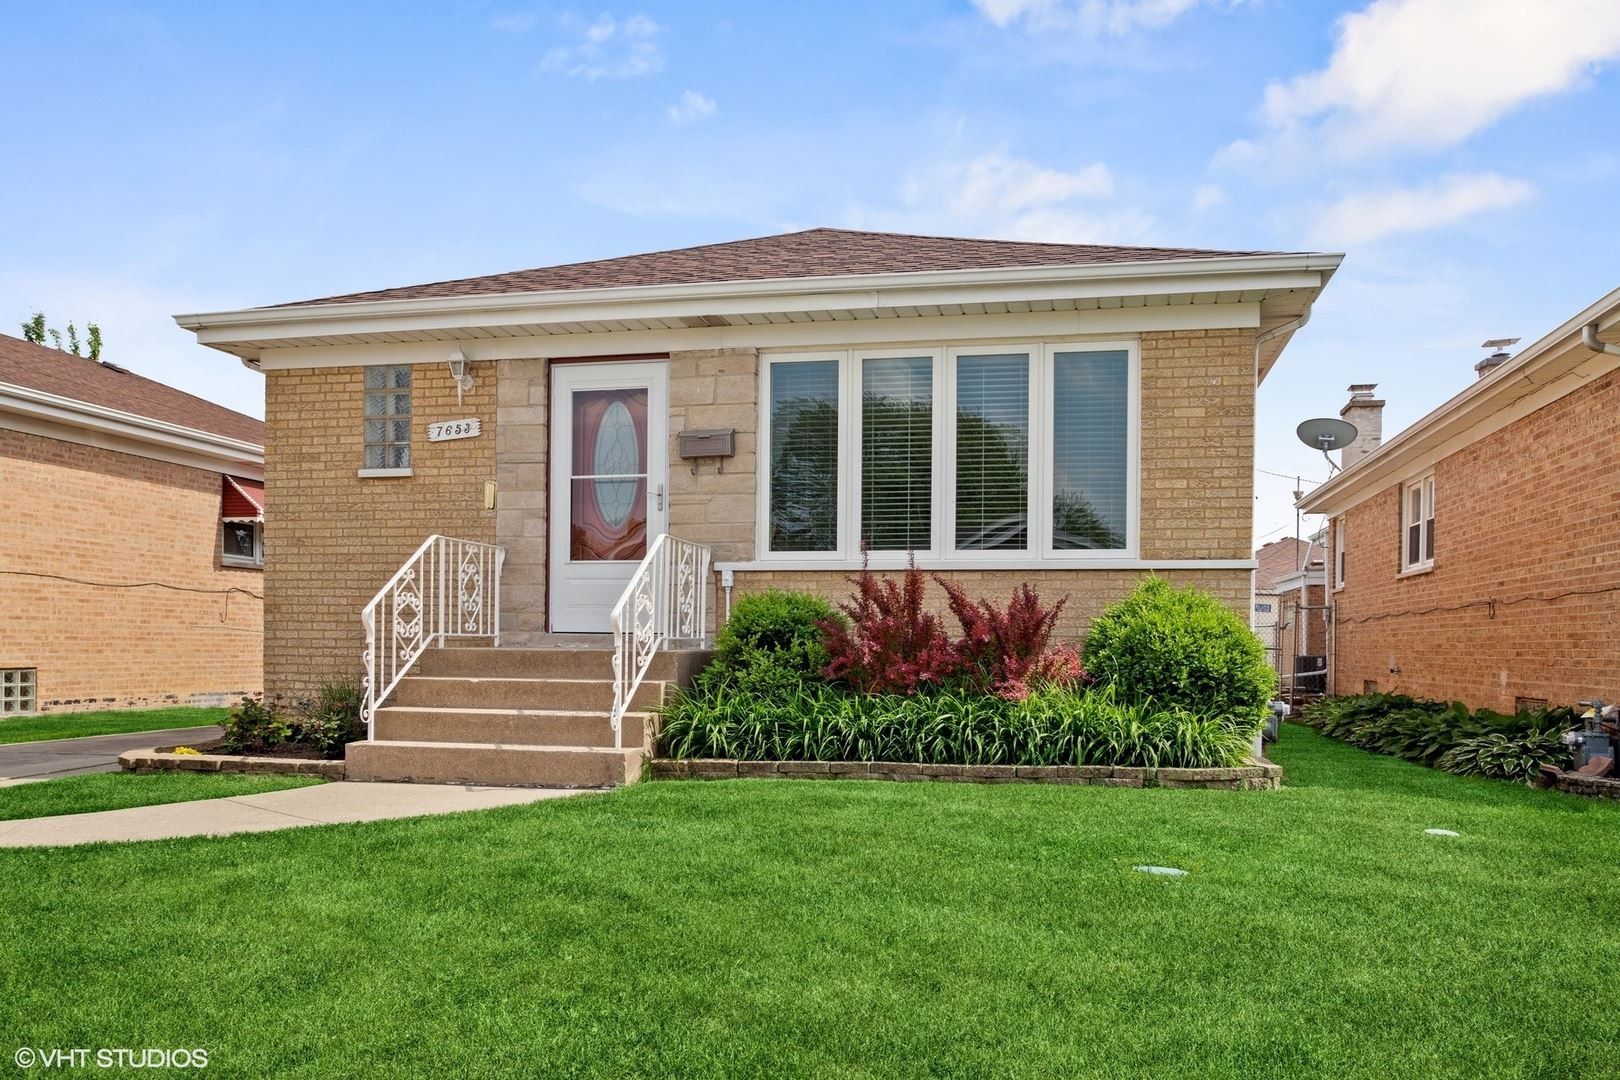 7653 W Strong Street, Norridge, IL 60706 - #: 11102878